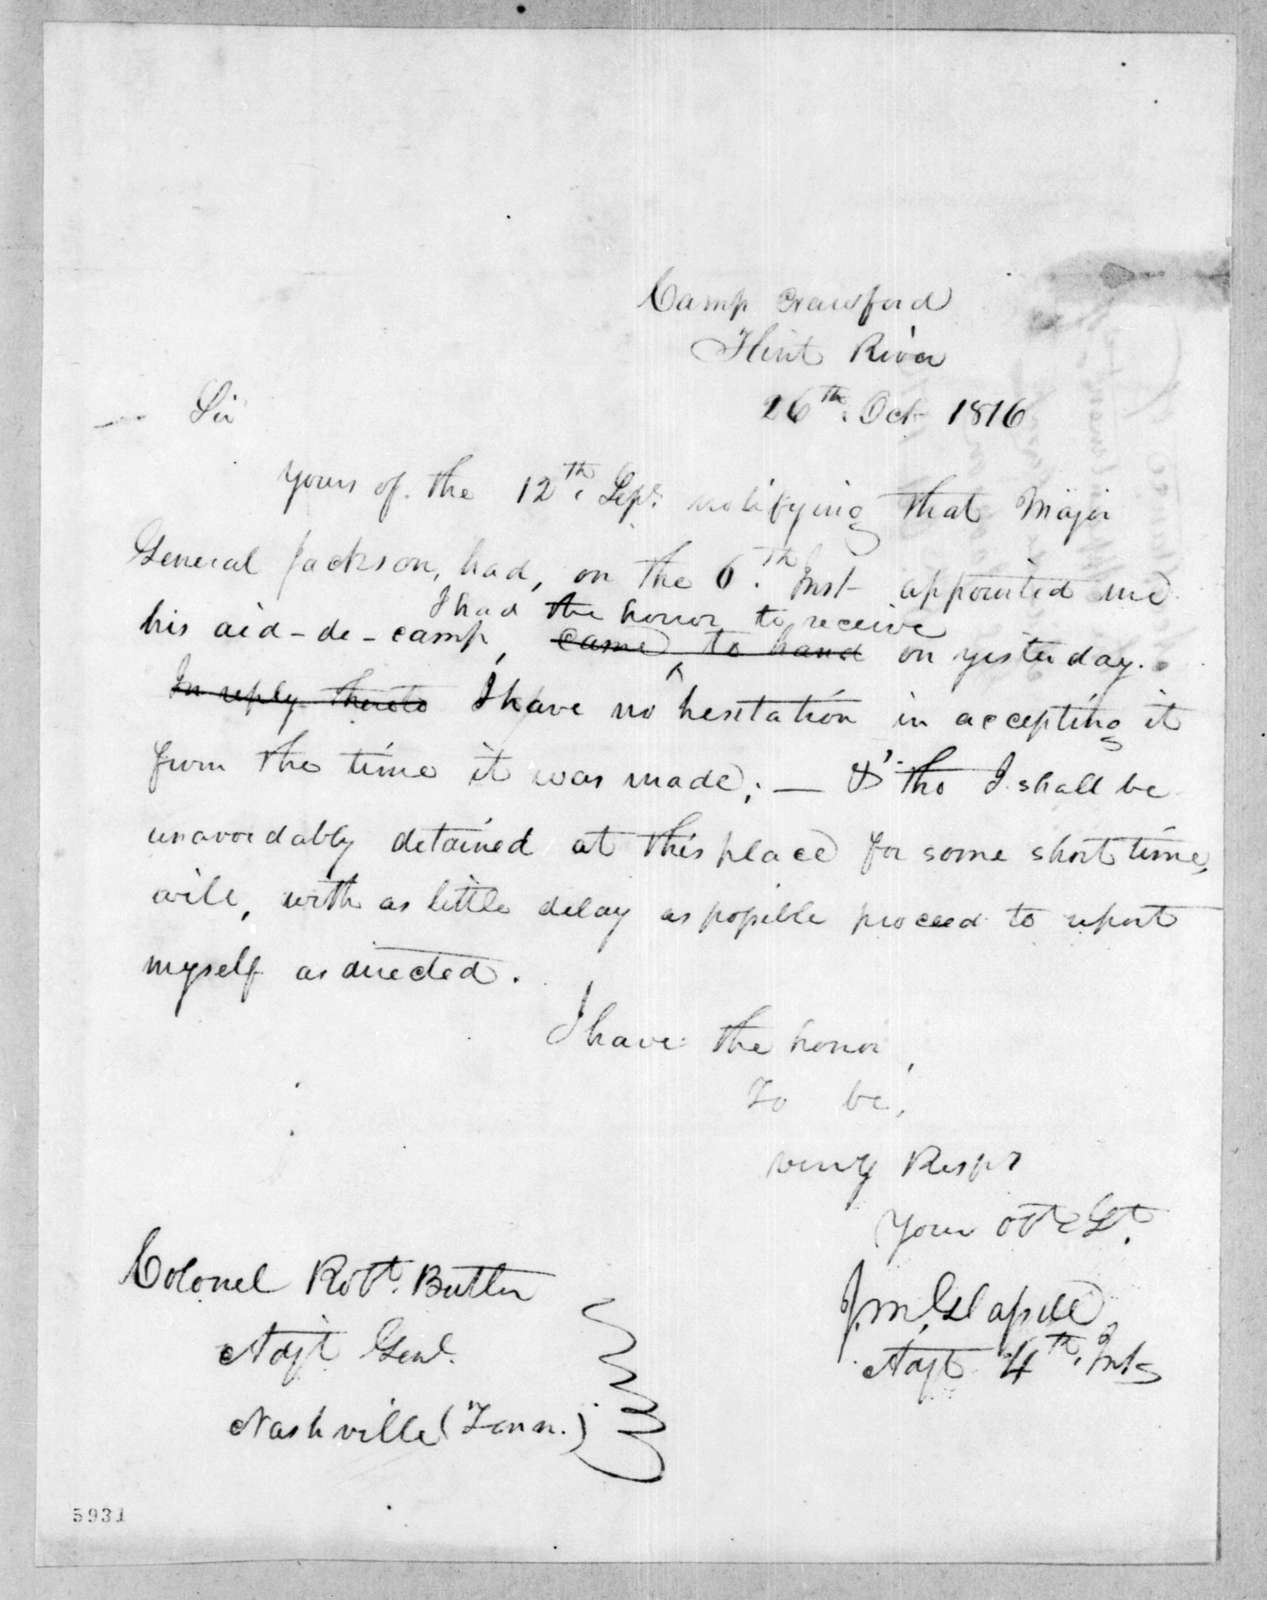 James McMillan Glassell to Robert Butler, October 26, 1816